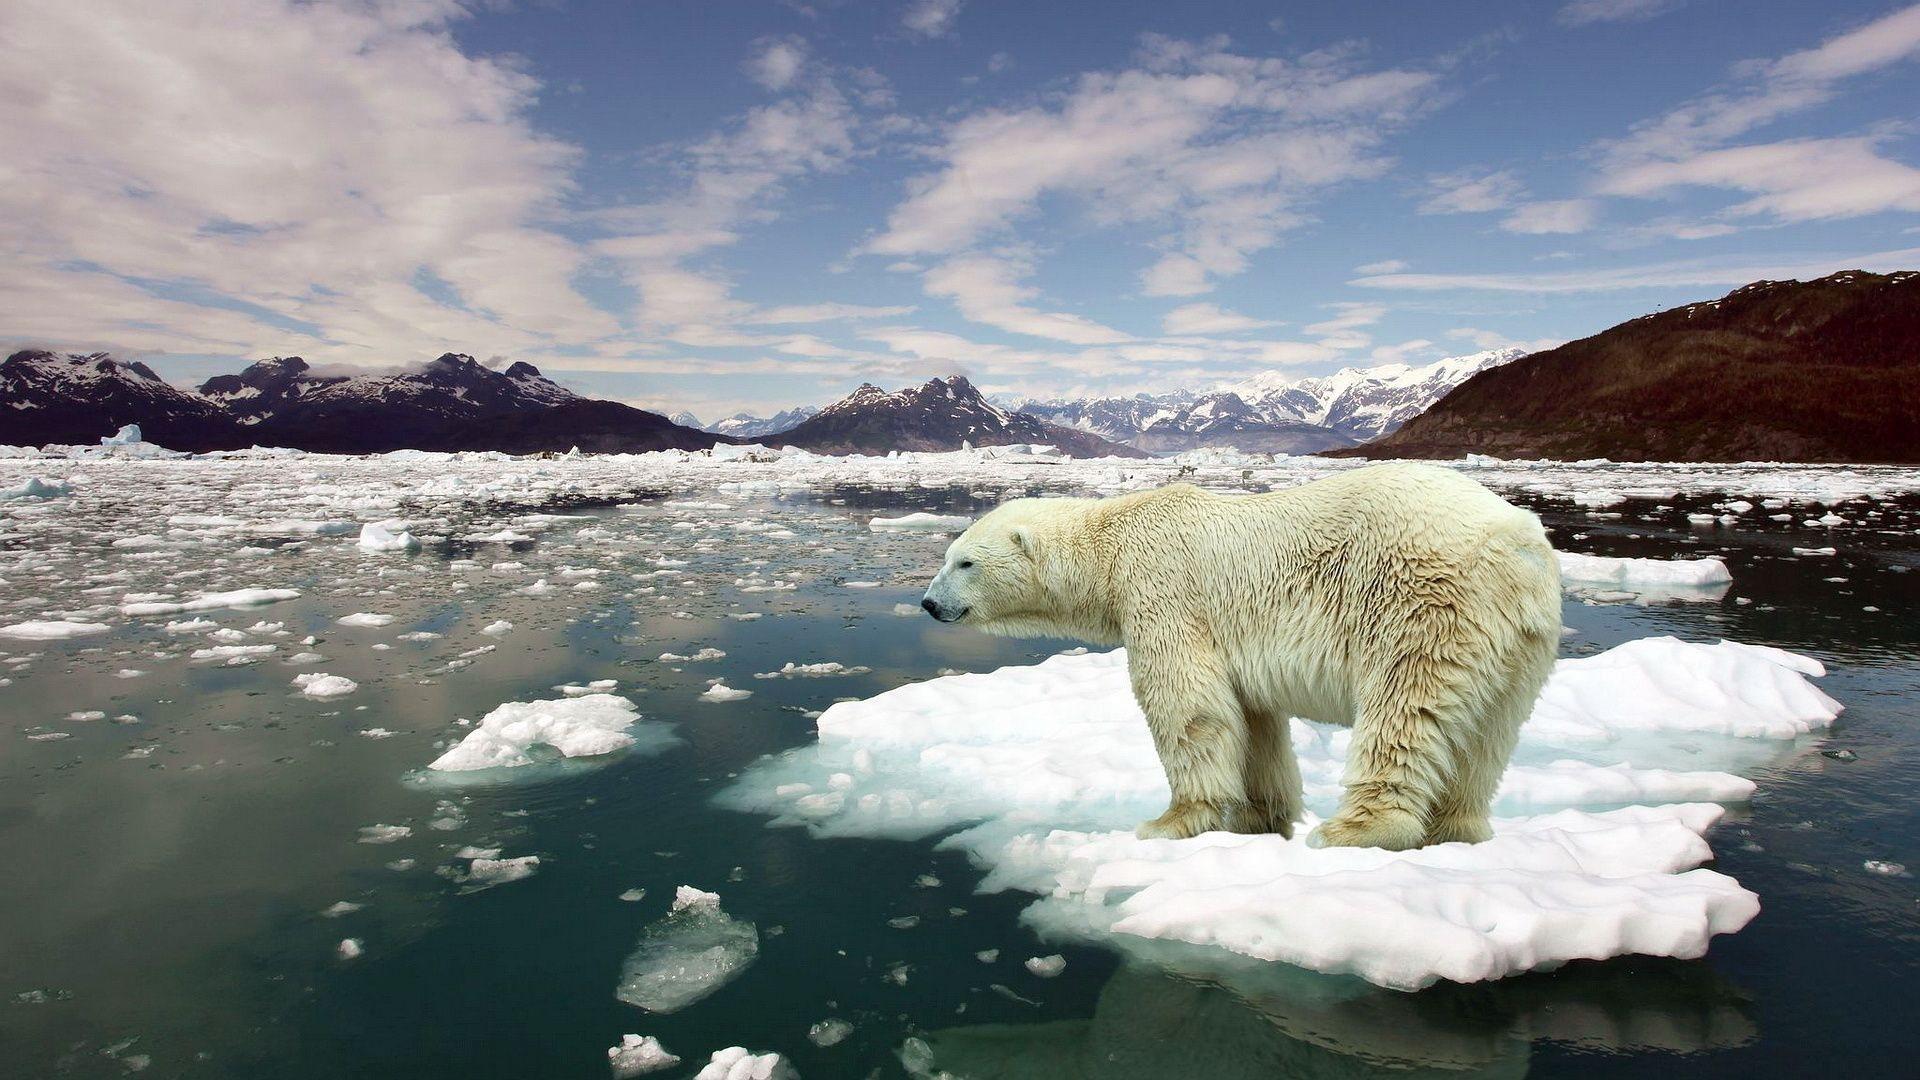 Image of a polar bear on a small ice flow